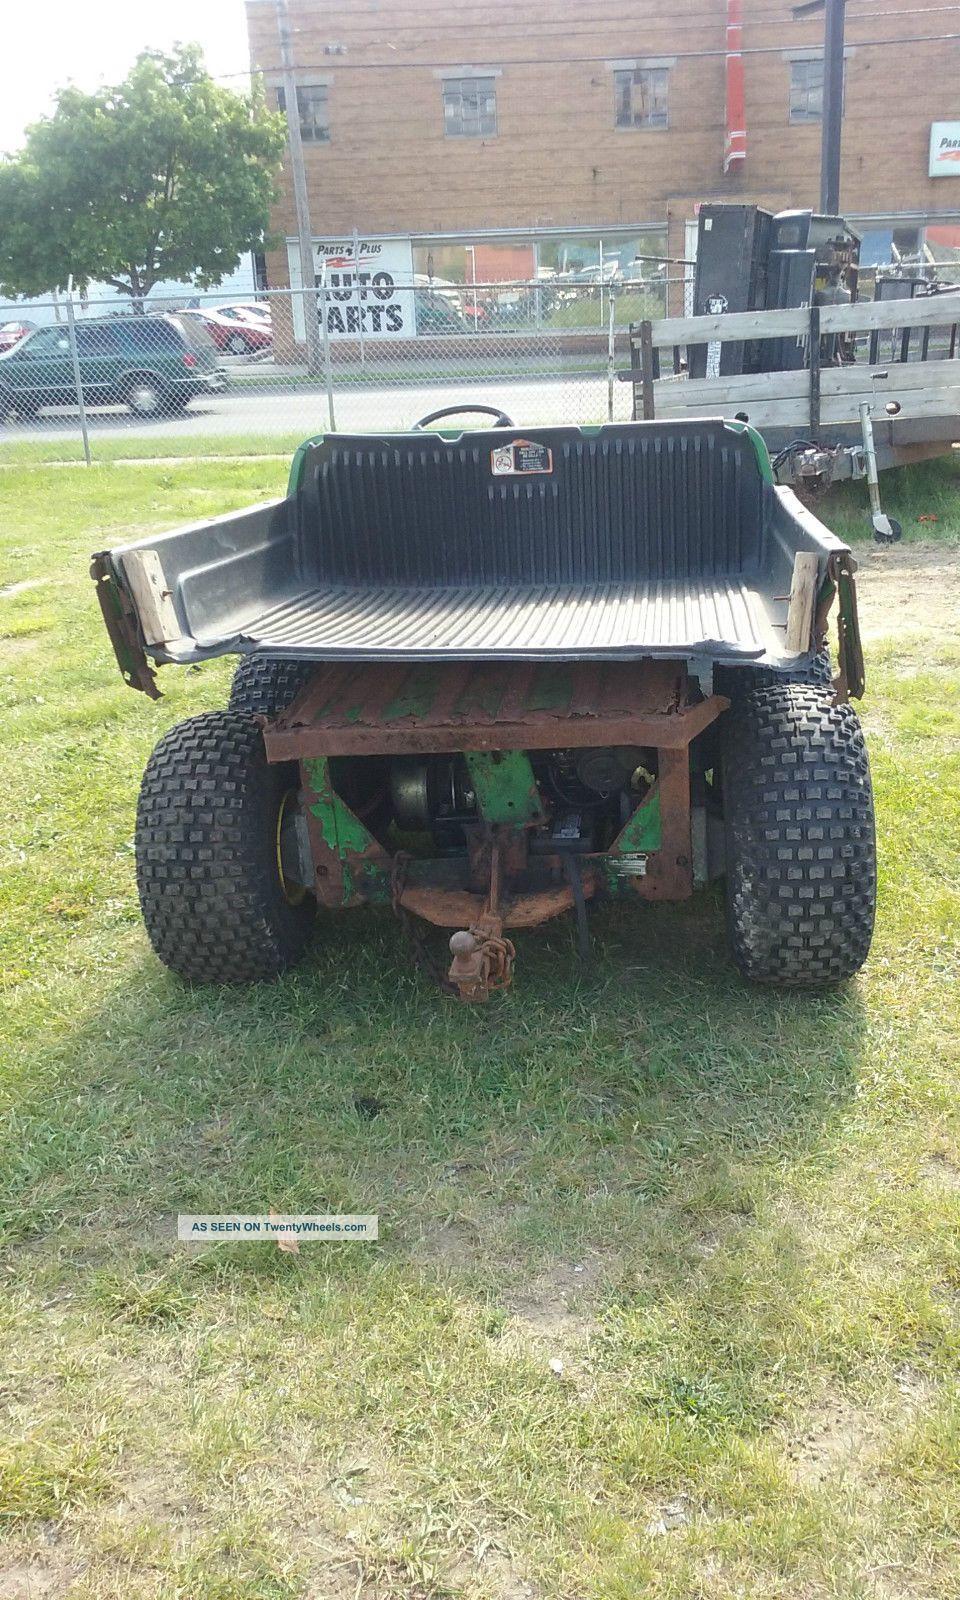 john deere gator diesel 6x4. Black Bedroom Furniture Sets. Home Design Ideas